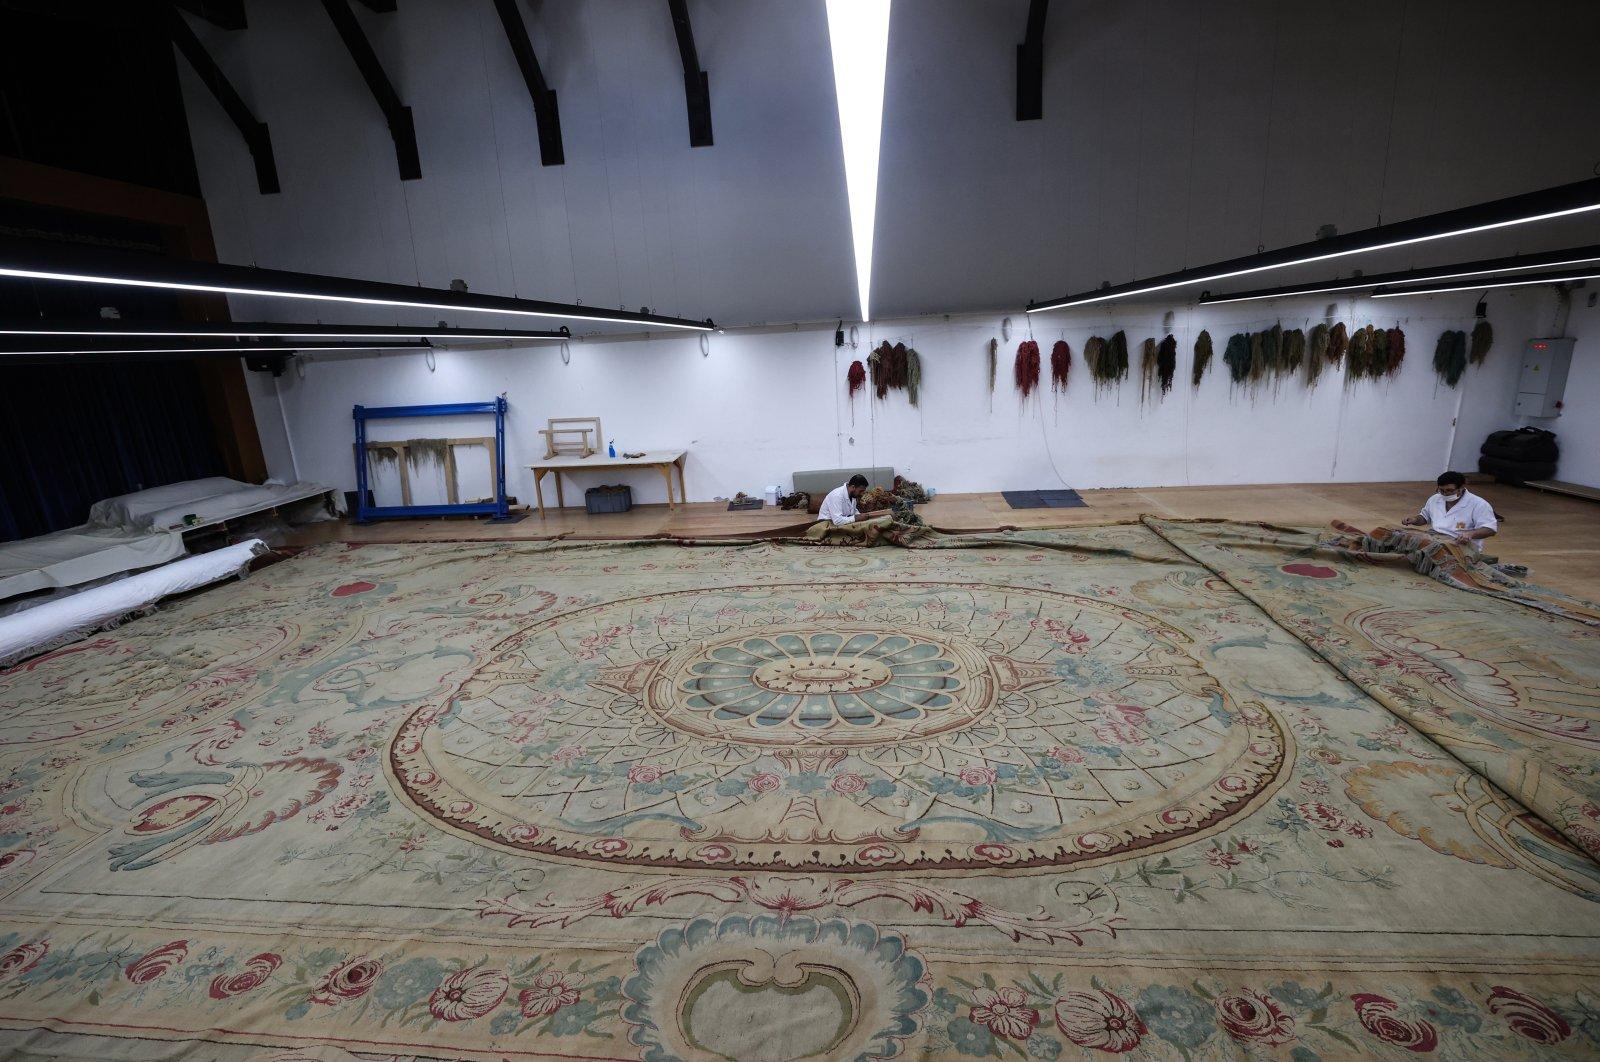 The carpet in the workshop of the Yıldız Şale Mansion, Istanbul, Turkey, June 17, 2021. (AA Photo)